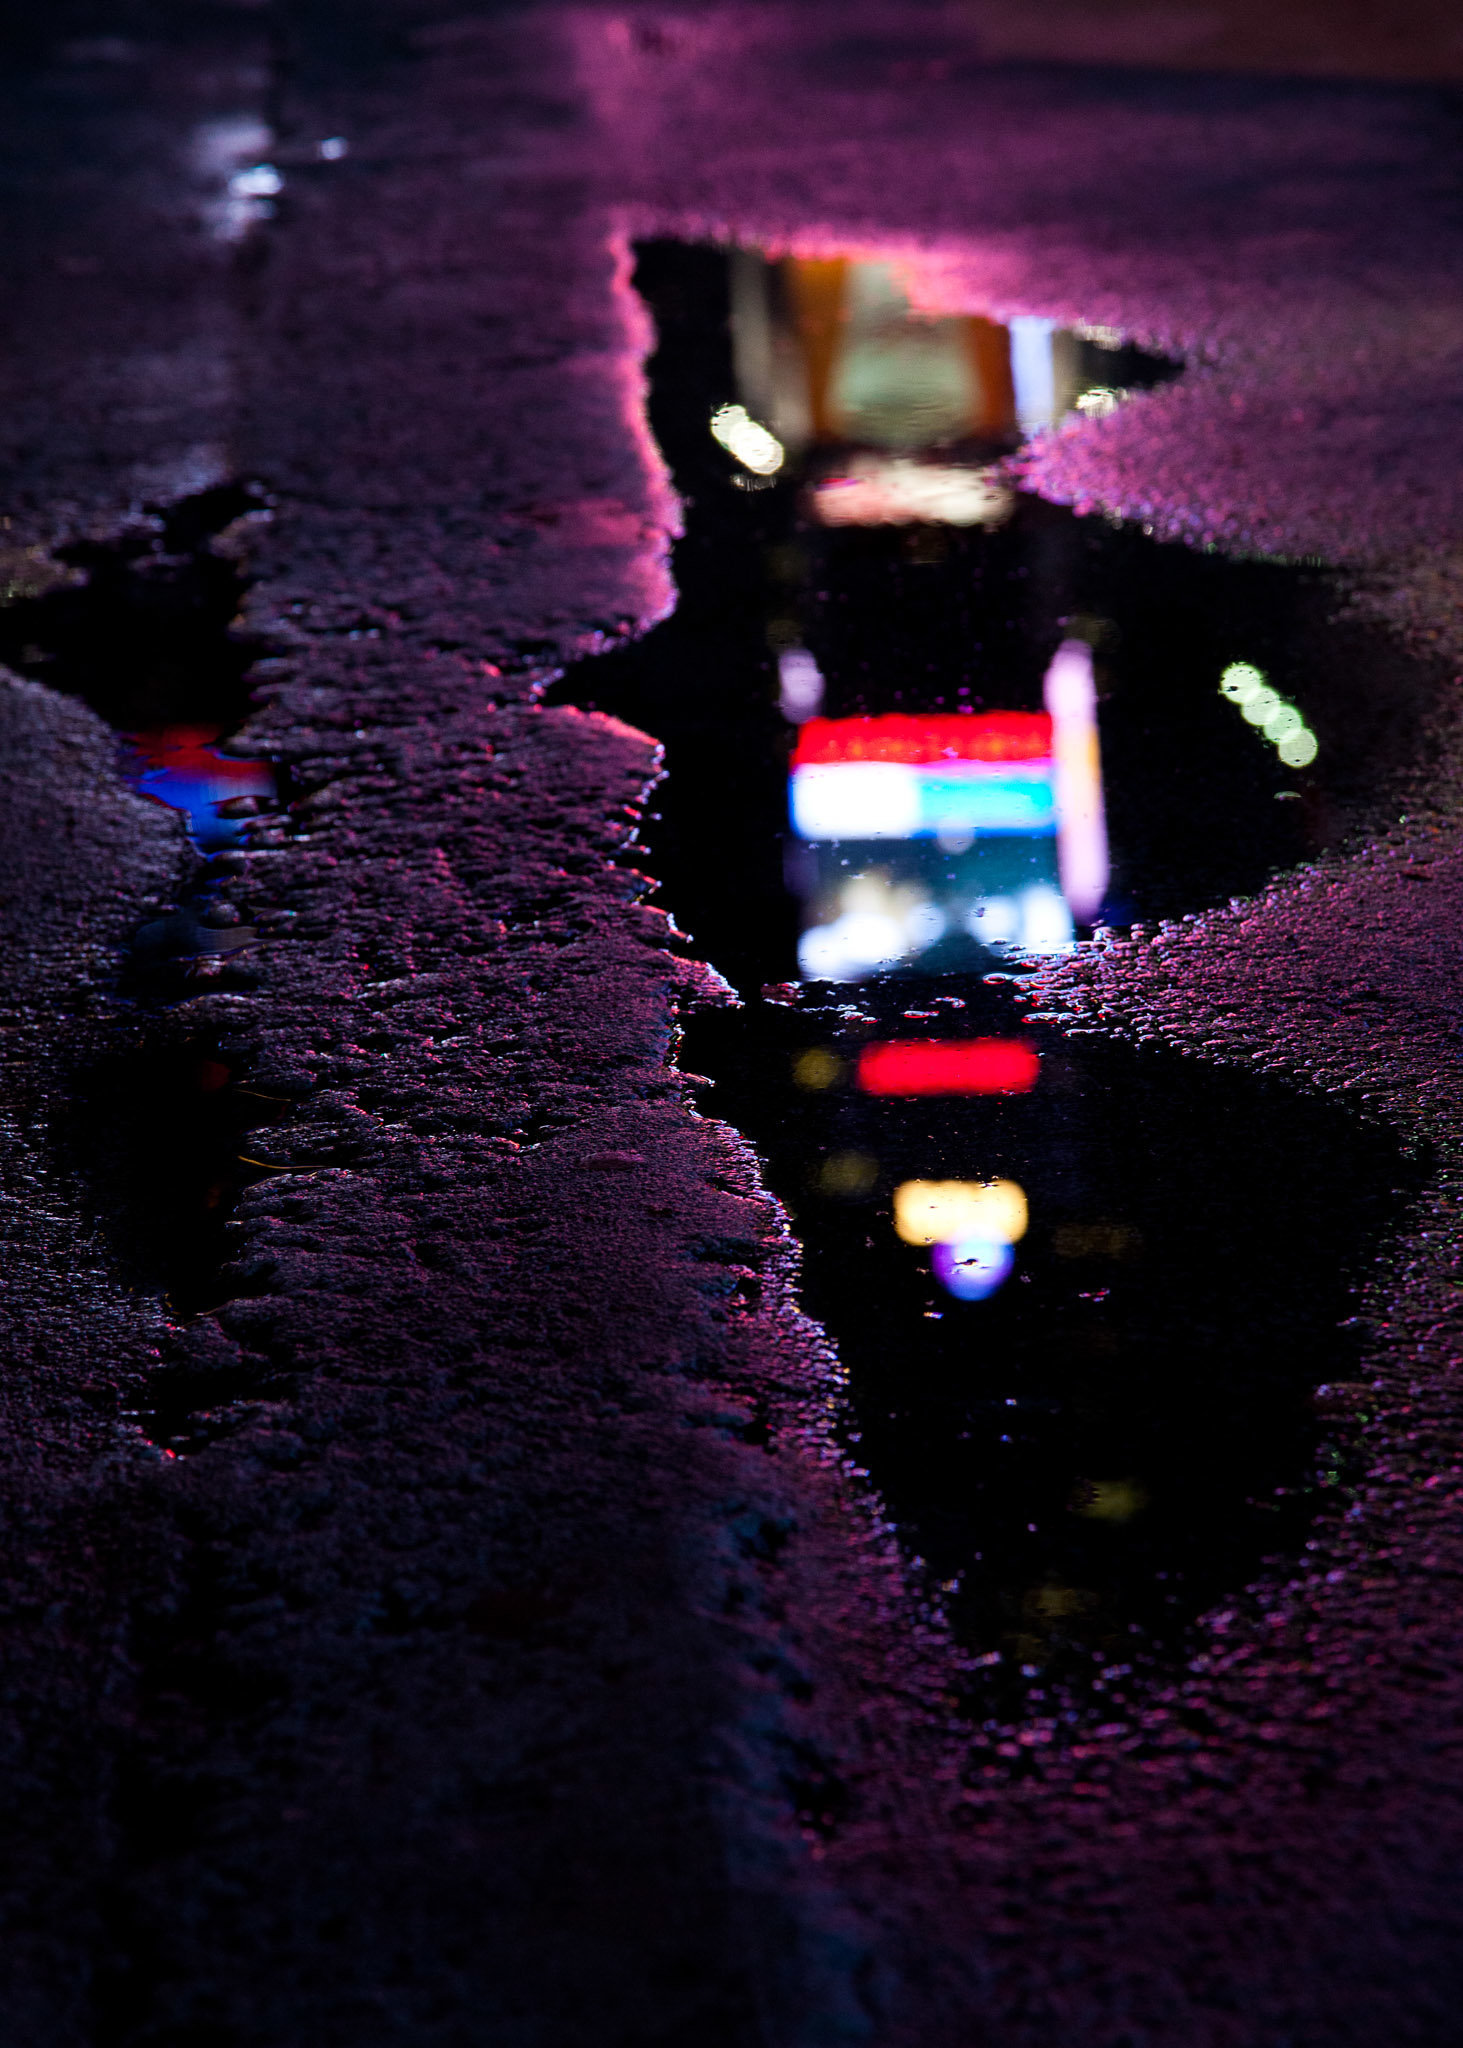 Times Square, 7:10pm